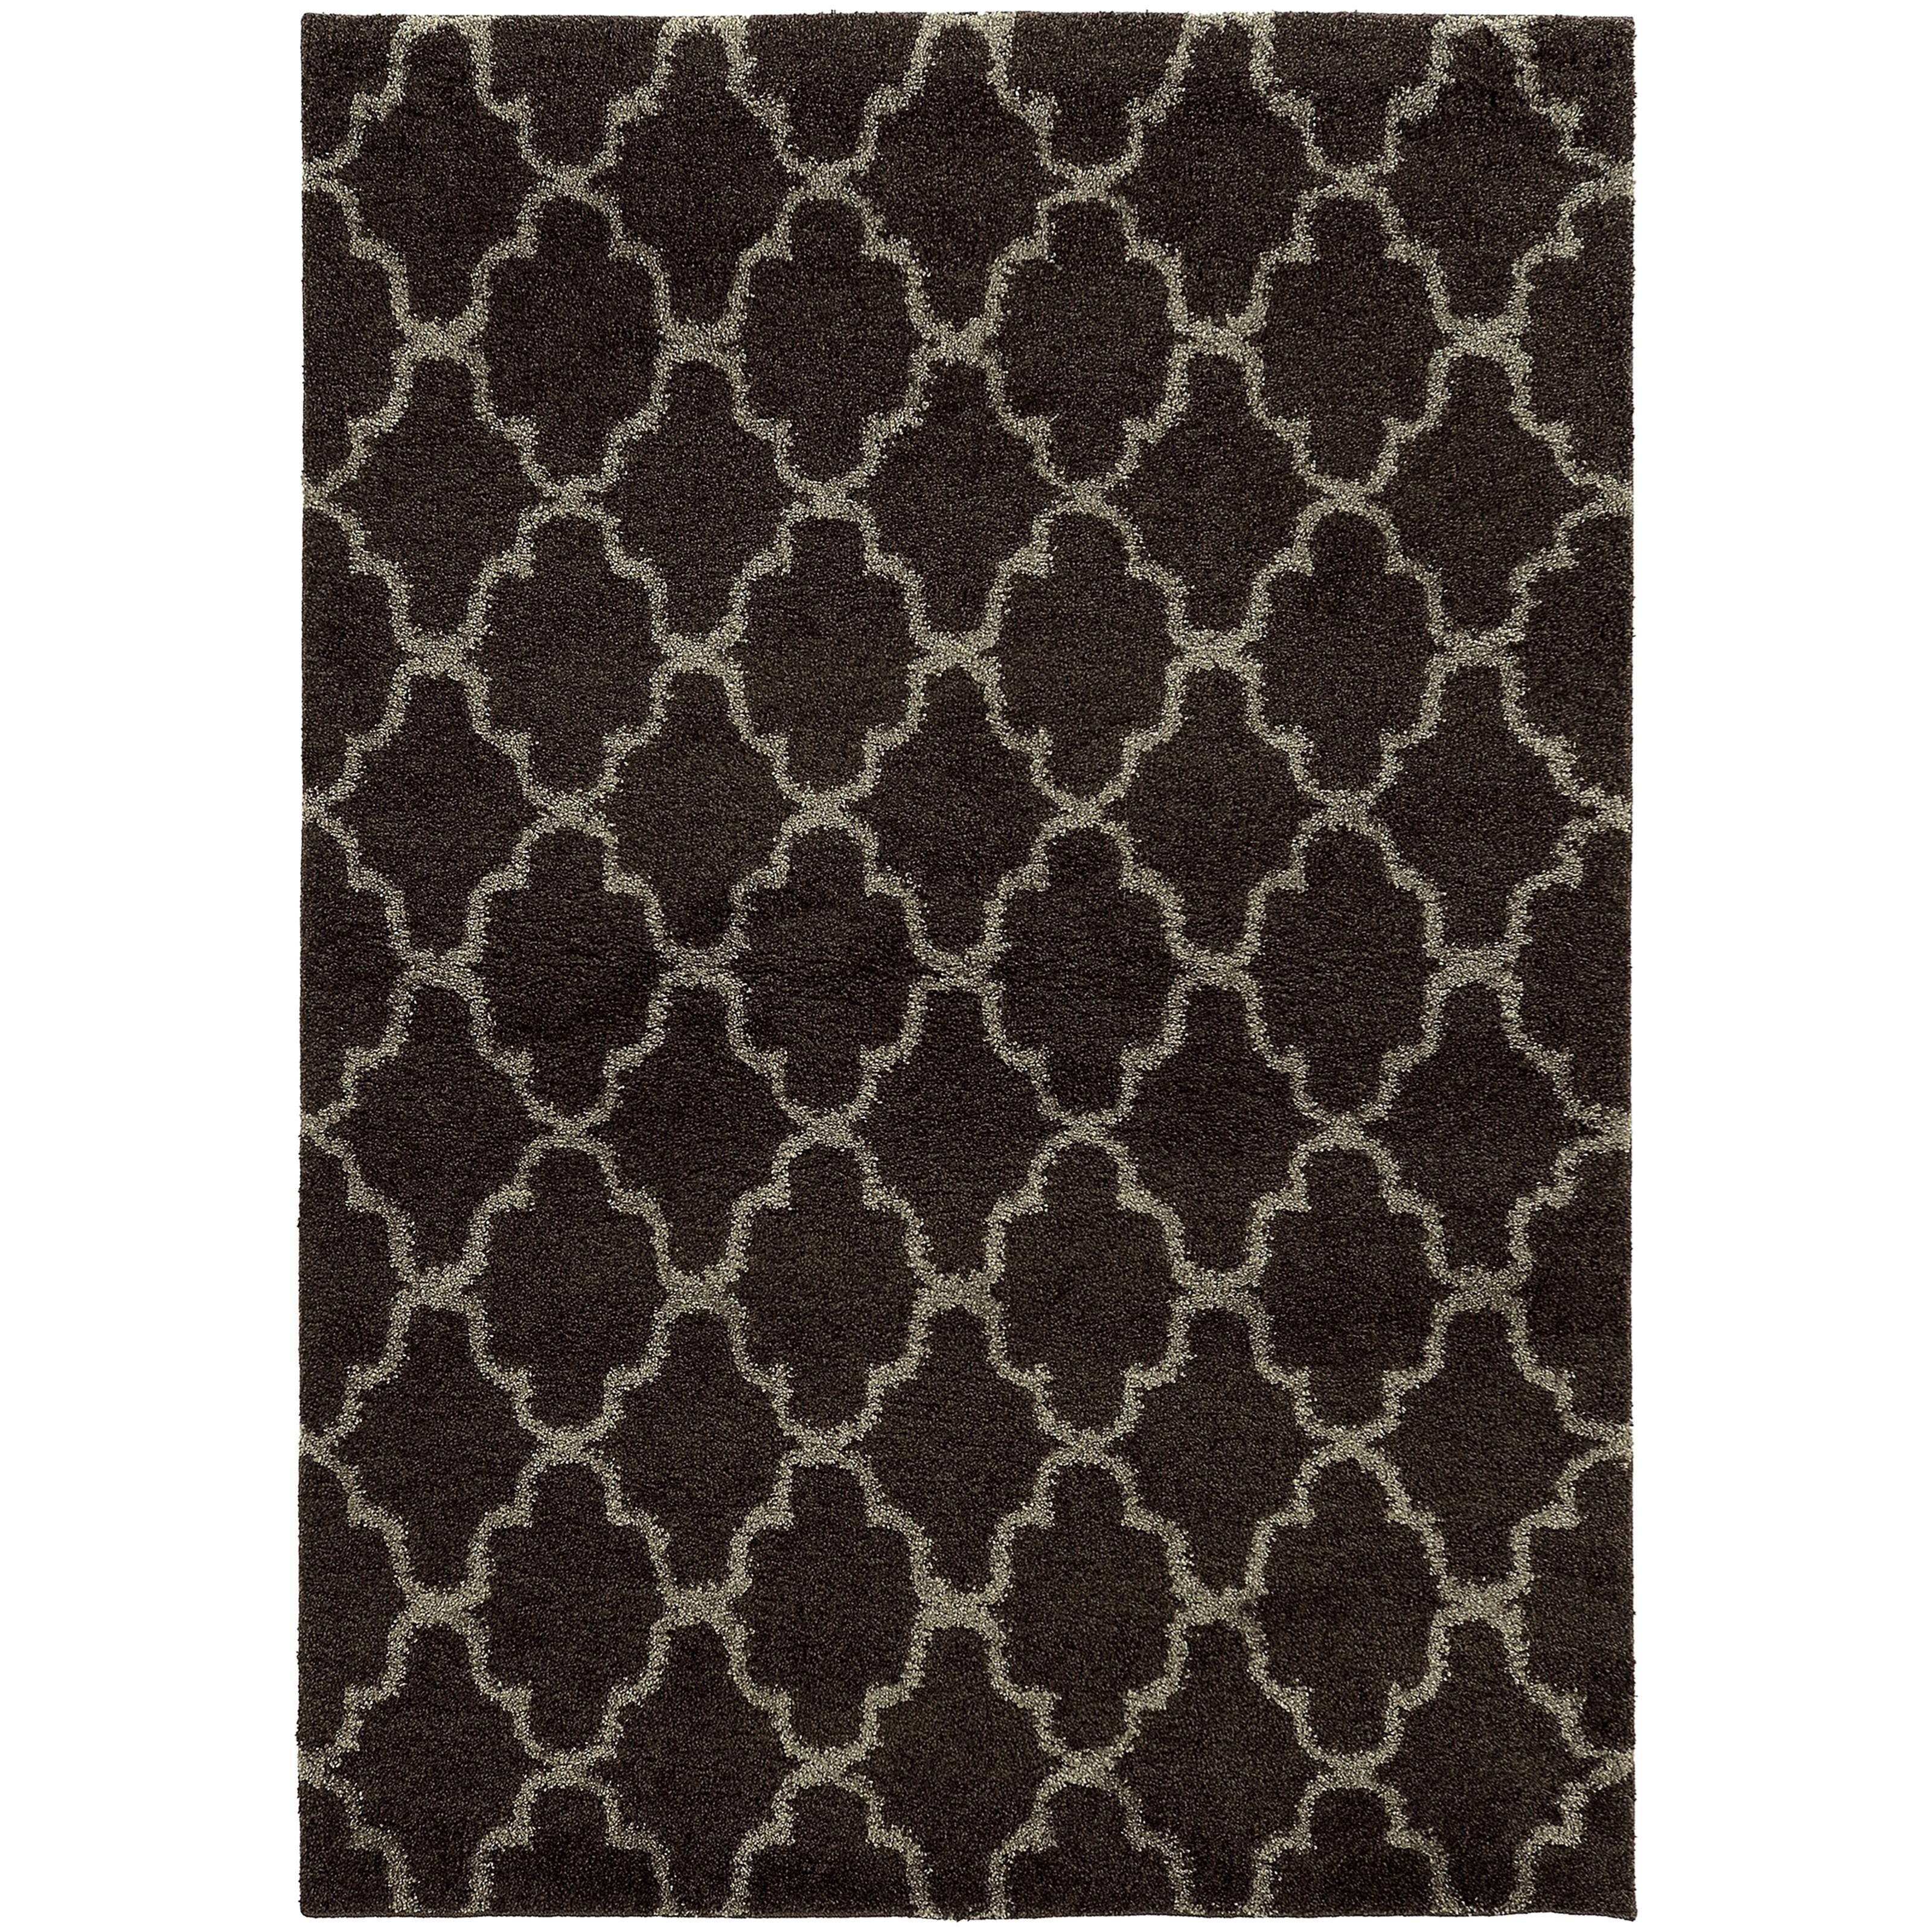 "Oriental Weavers Covington 7'10"" X 10'10"" Rectangle Area Rug - Item Number: COV91K710X1010"